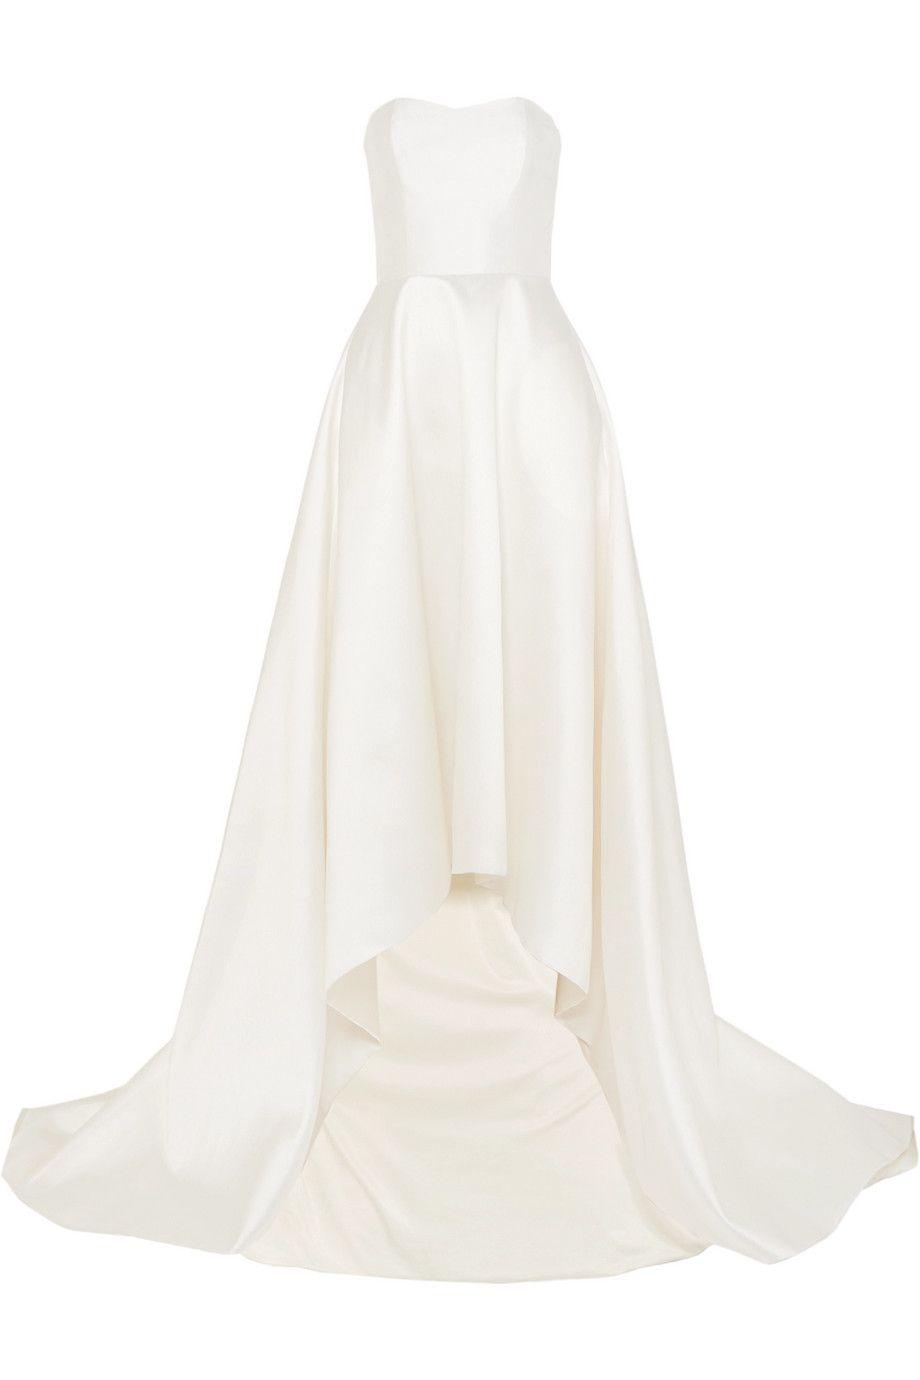 off the rack wedding dress